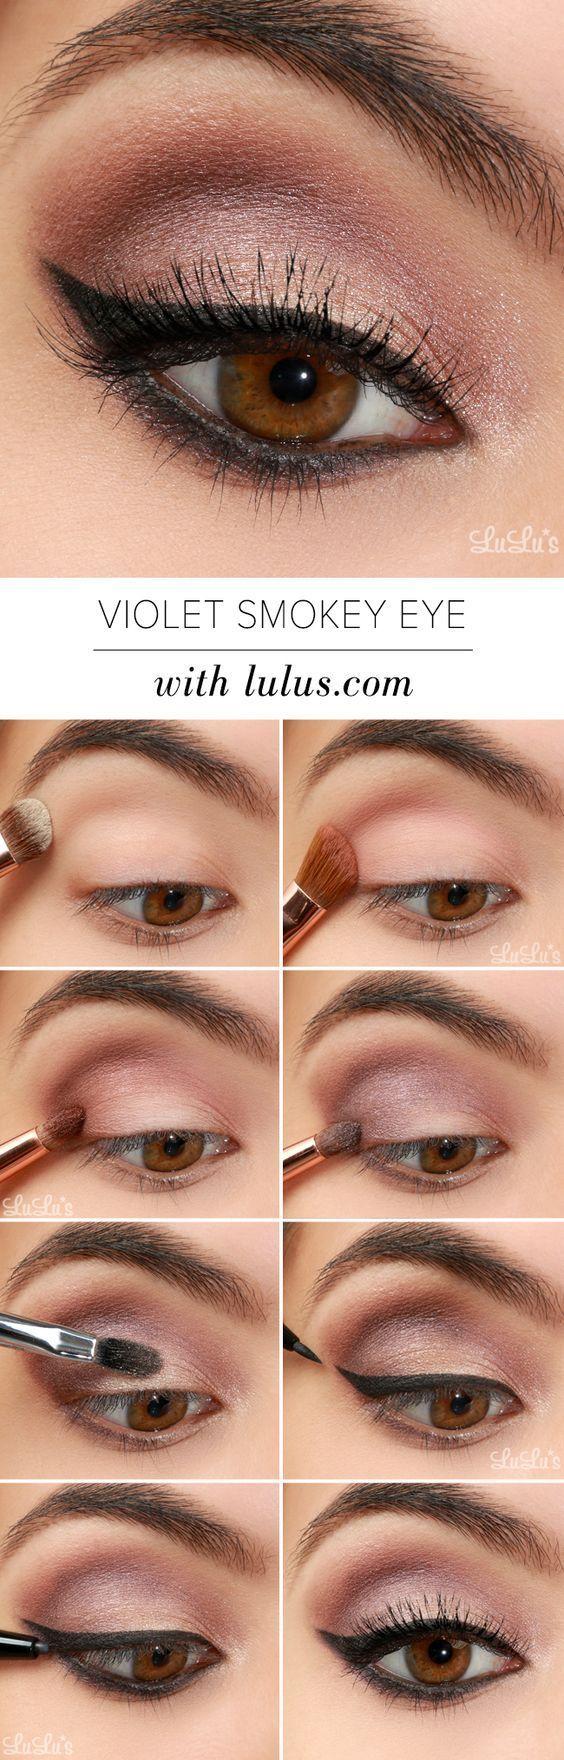 violet-smokey-eye-makeup via